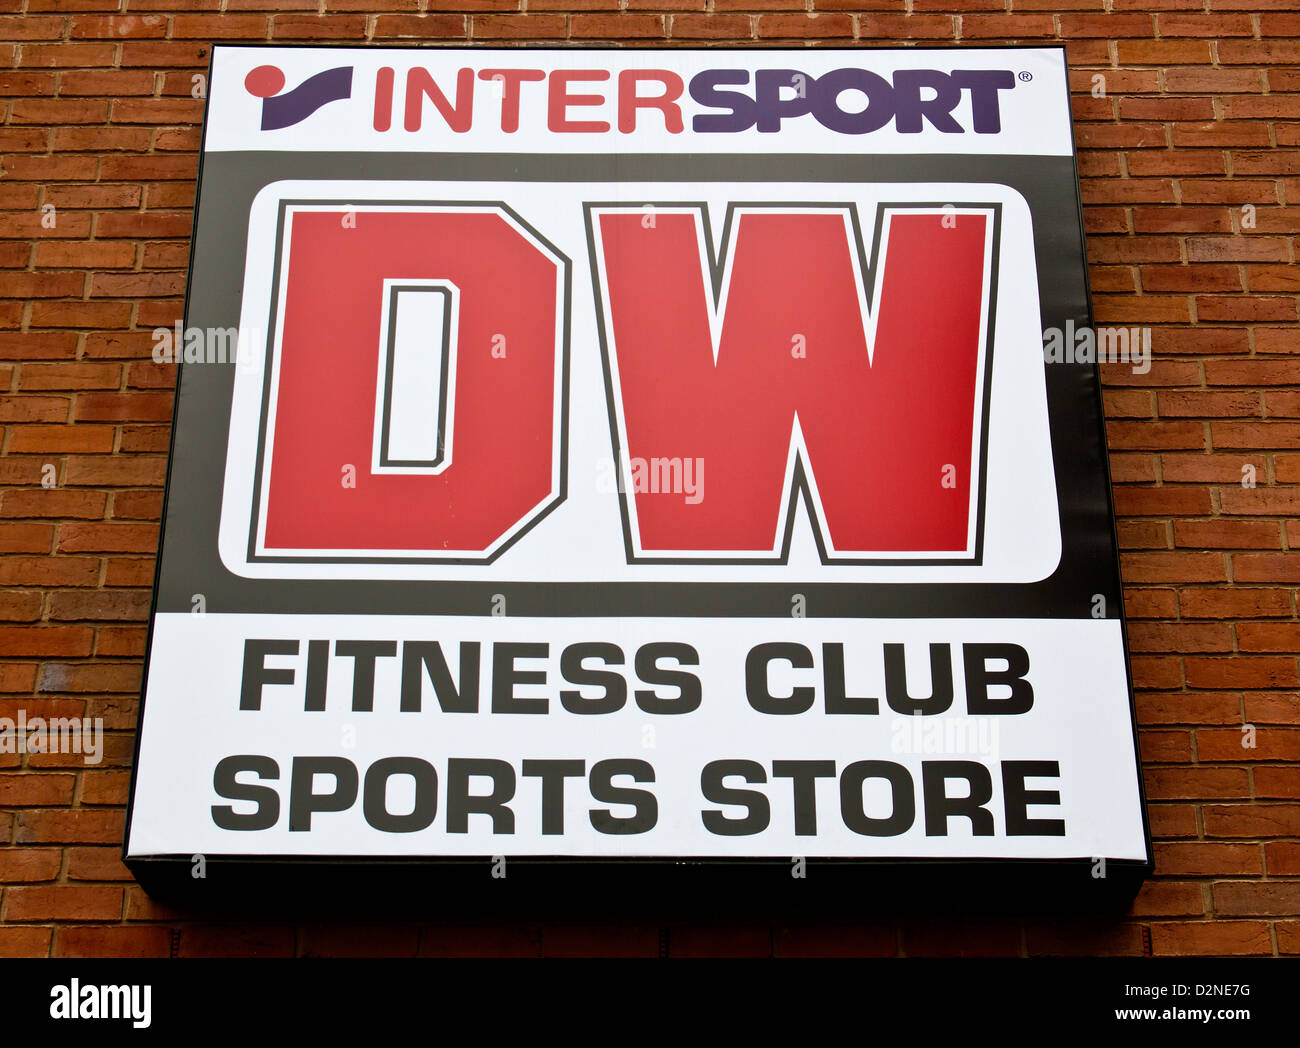 Fitness Club Intersport DW Sport Store Kidderminster - Stock Image